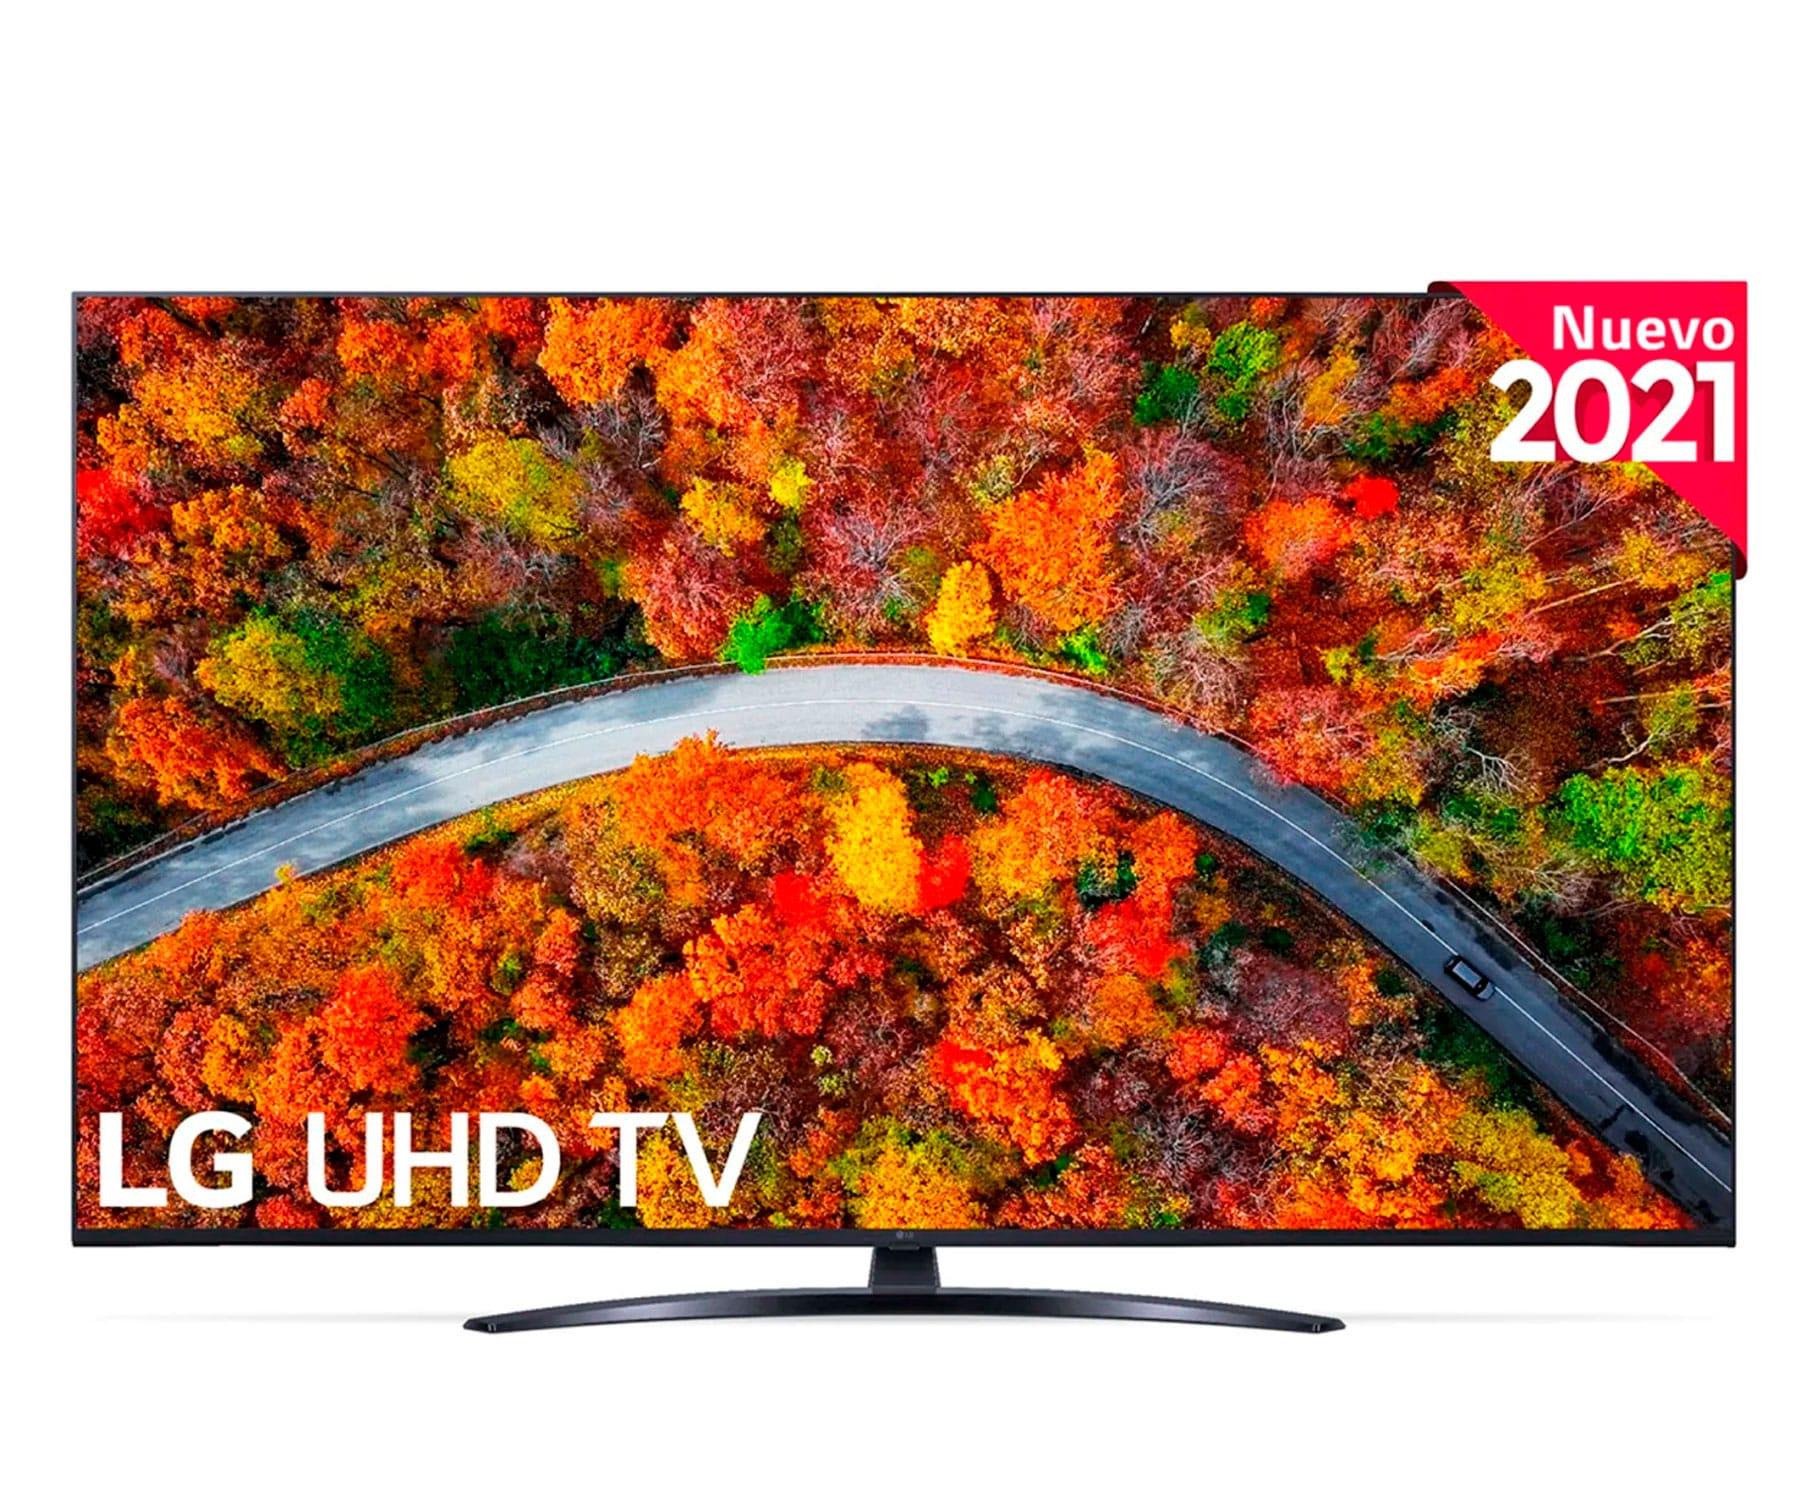 LG 43UP81006LA TELEVISOR 43'' LED UHD 4K SMART TV WEBOS 6.0 WIFI HDMI BLUETOOTH